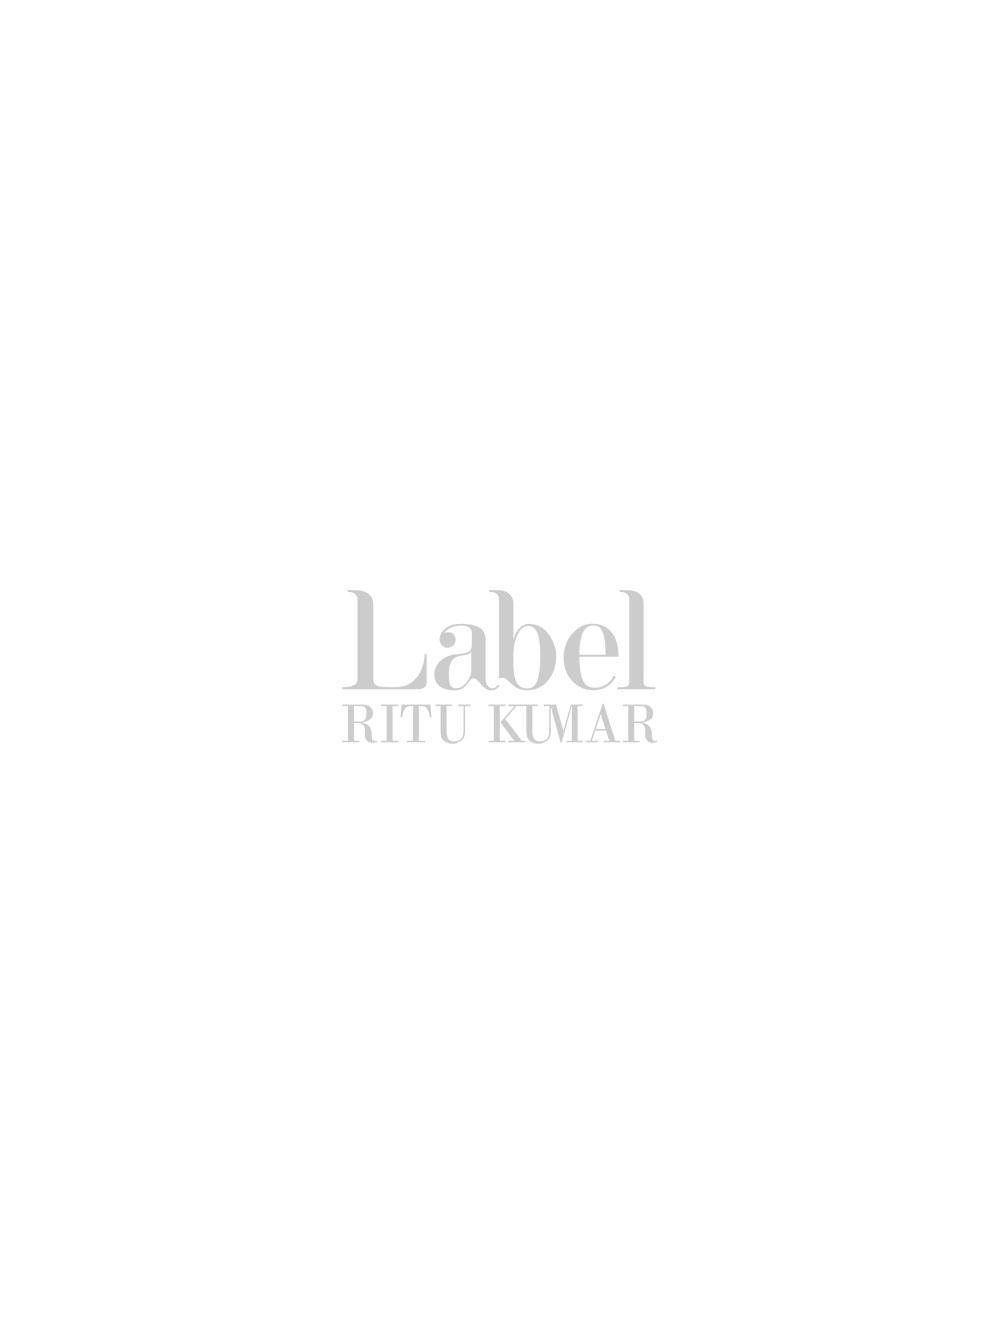 Black Flared Pants  by label ritu kumar